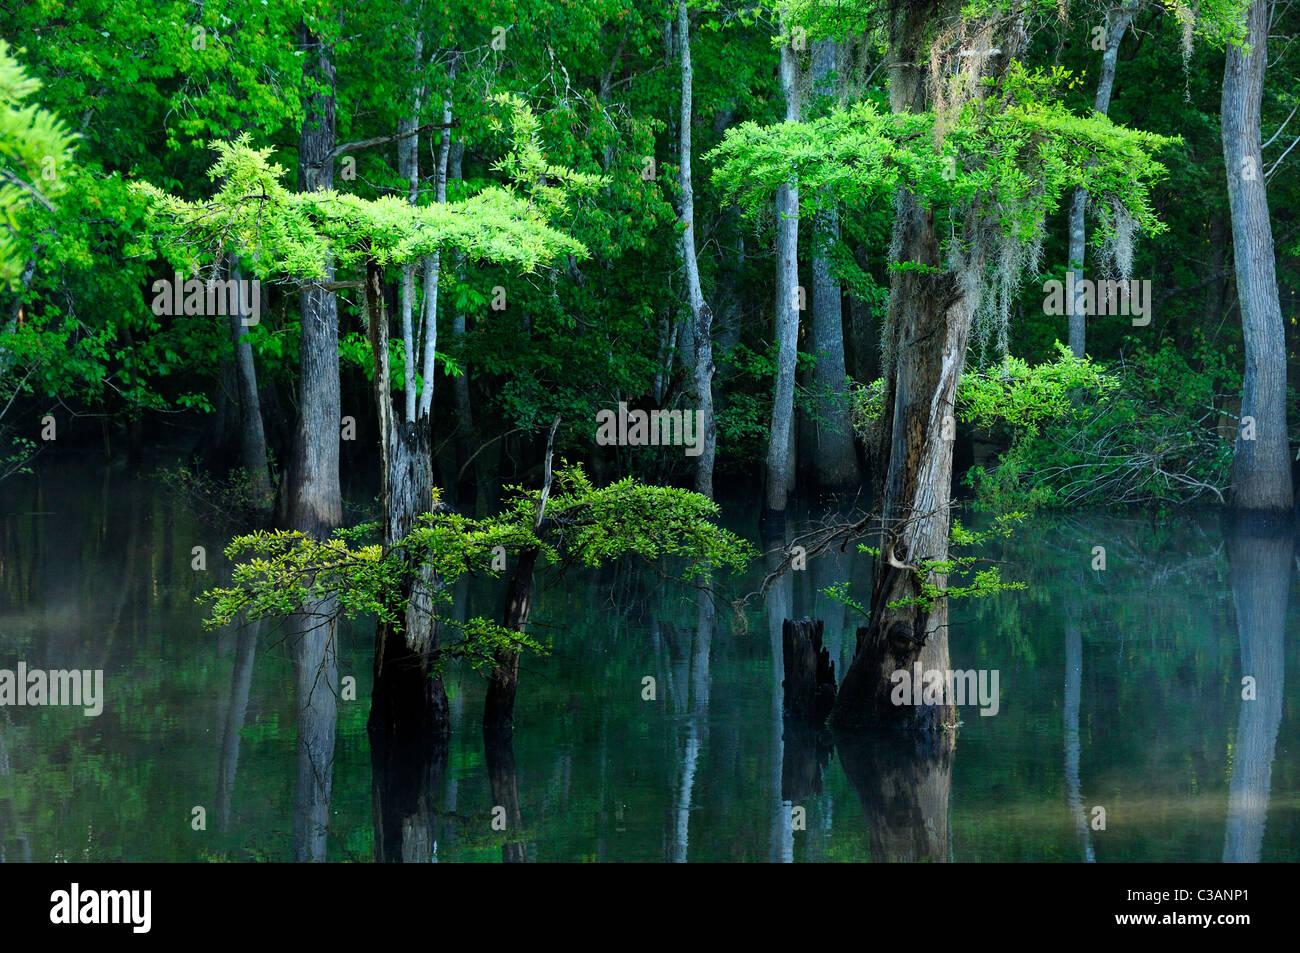 Ciprés Calvo, Taxodium distichum, Morrison Springs, Condado de Walton, Florida Imagen De Stock